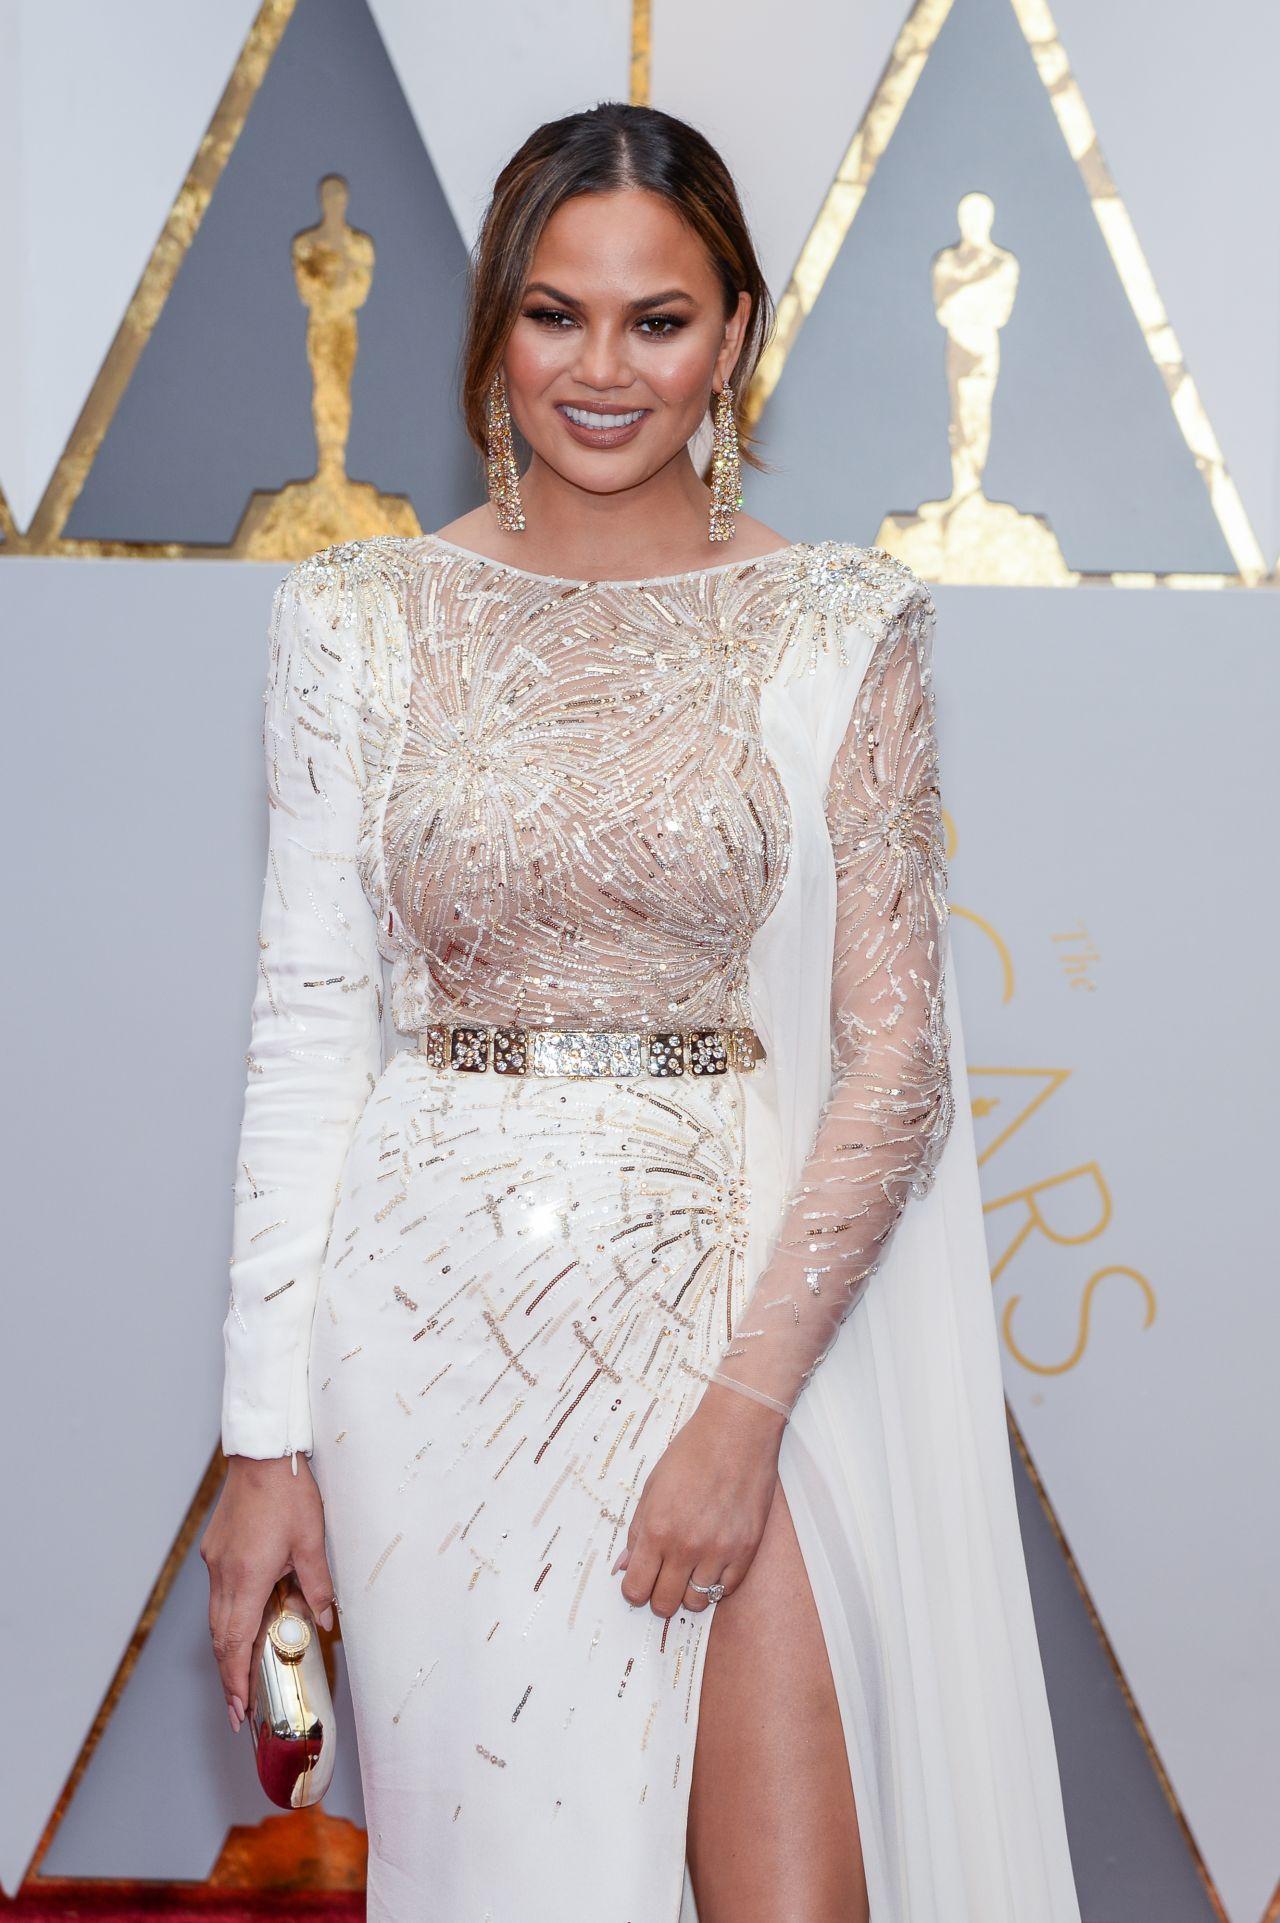 Chrissy Teigen Oscars 2017 Red Carpet In Hollywood